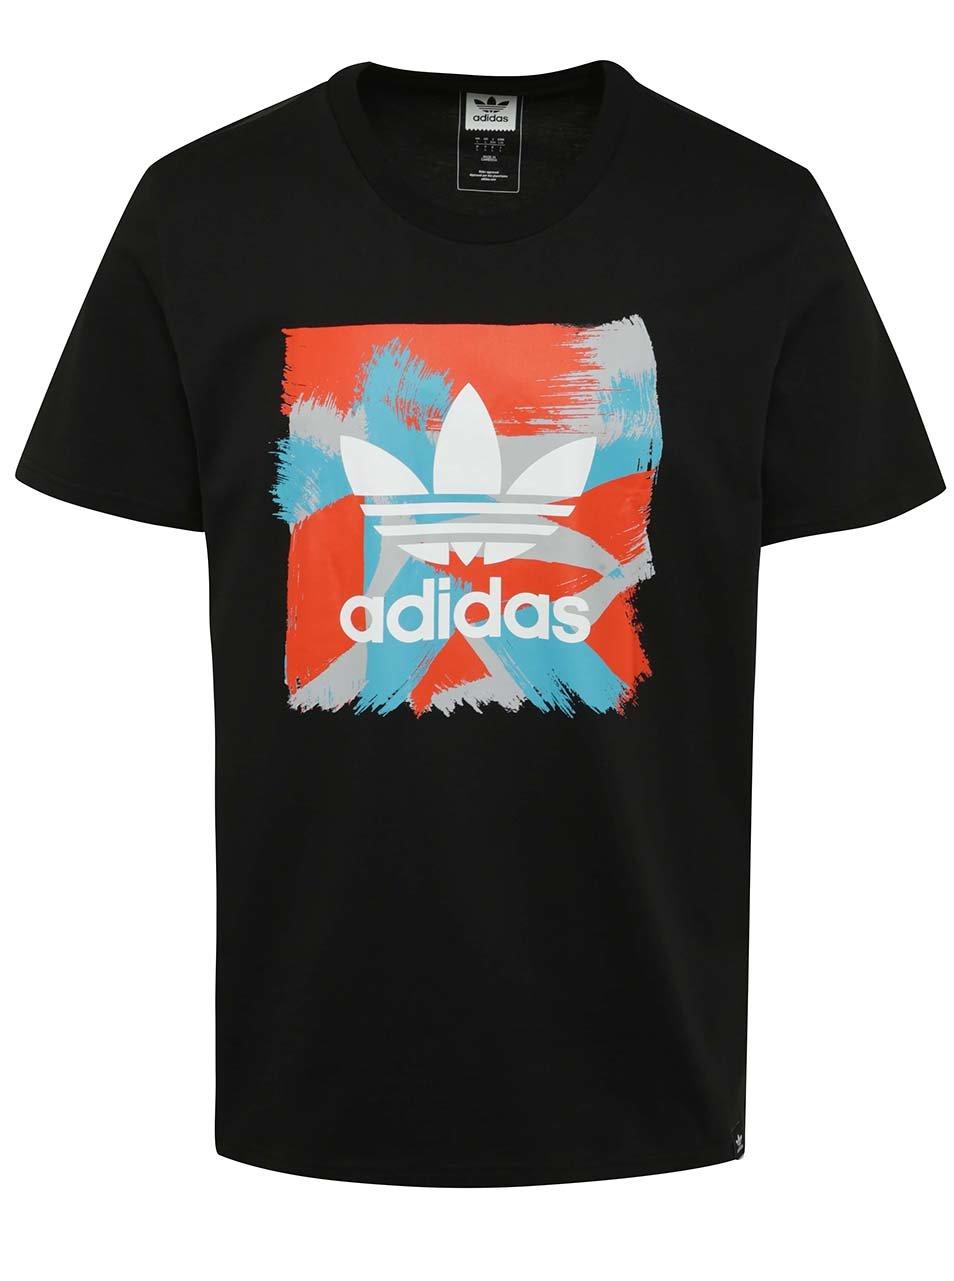 Černé pánské triko s krátkým rukávem a barevným potiskem adidas Originals